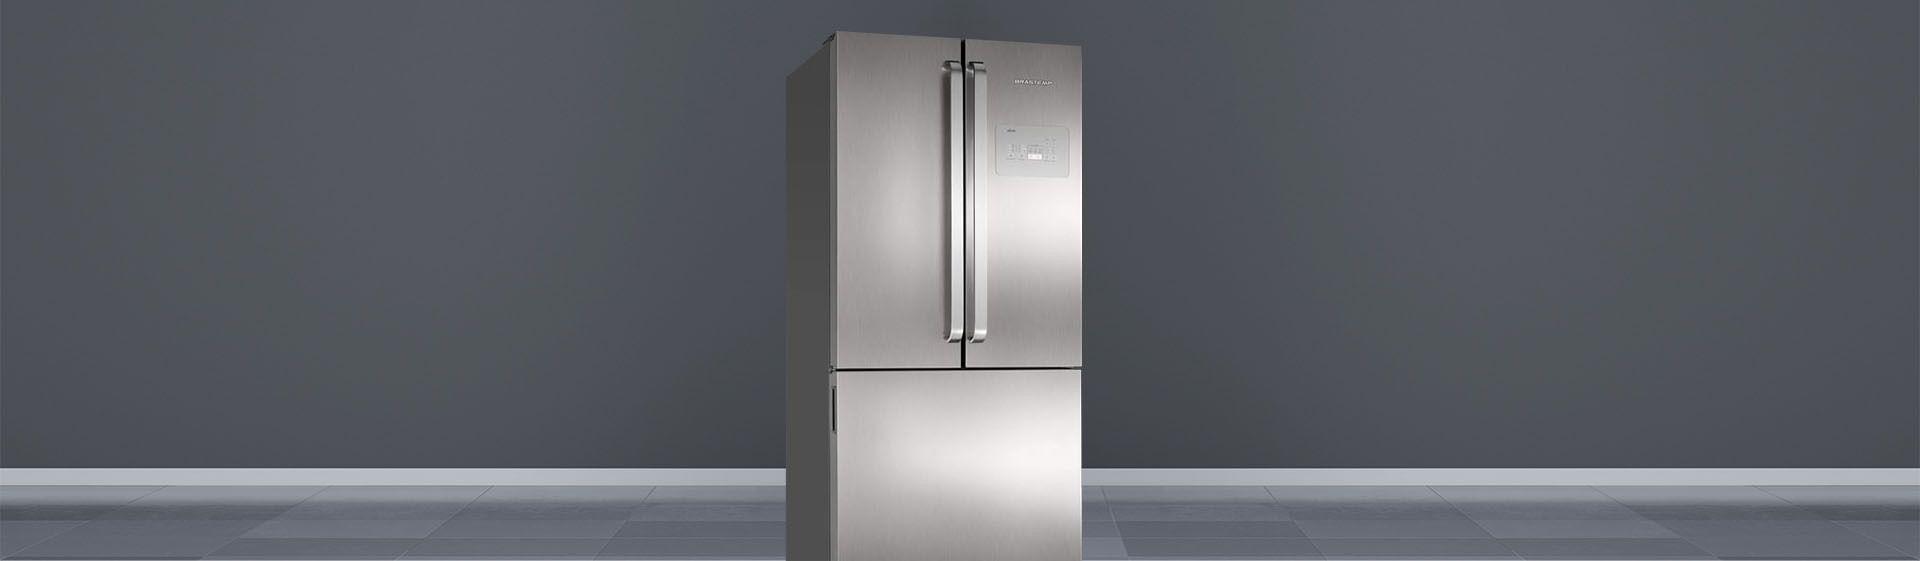 Brastemp BRO80A: análise de ficha técnica dessa geladeira inverse French Door